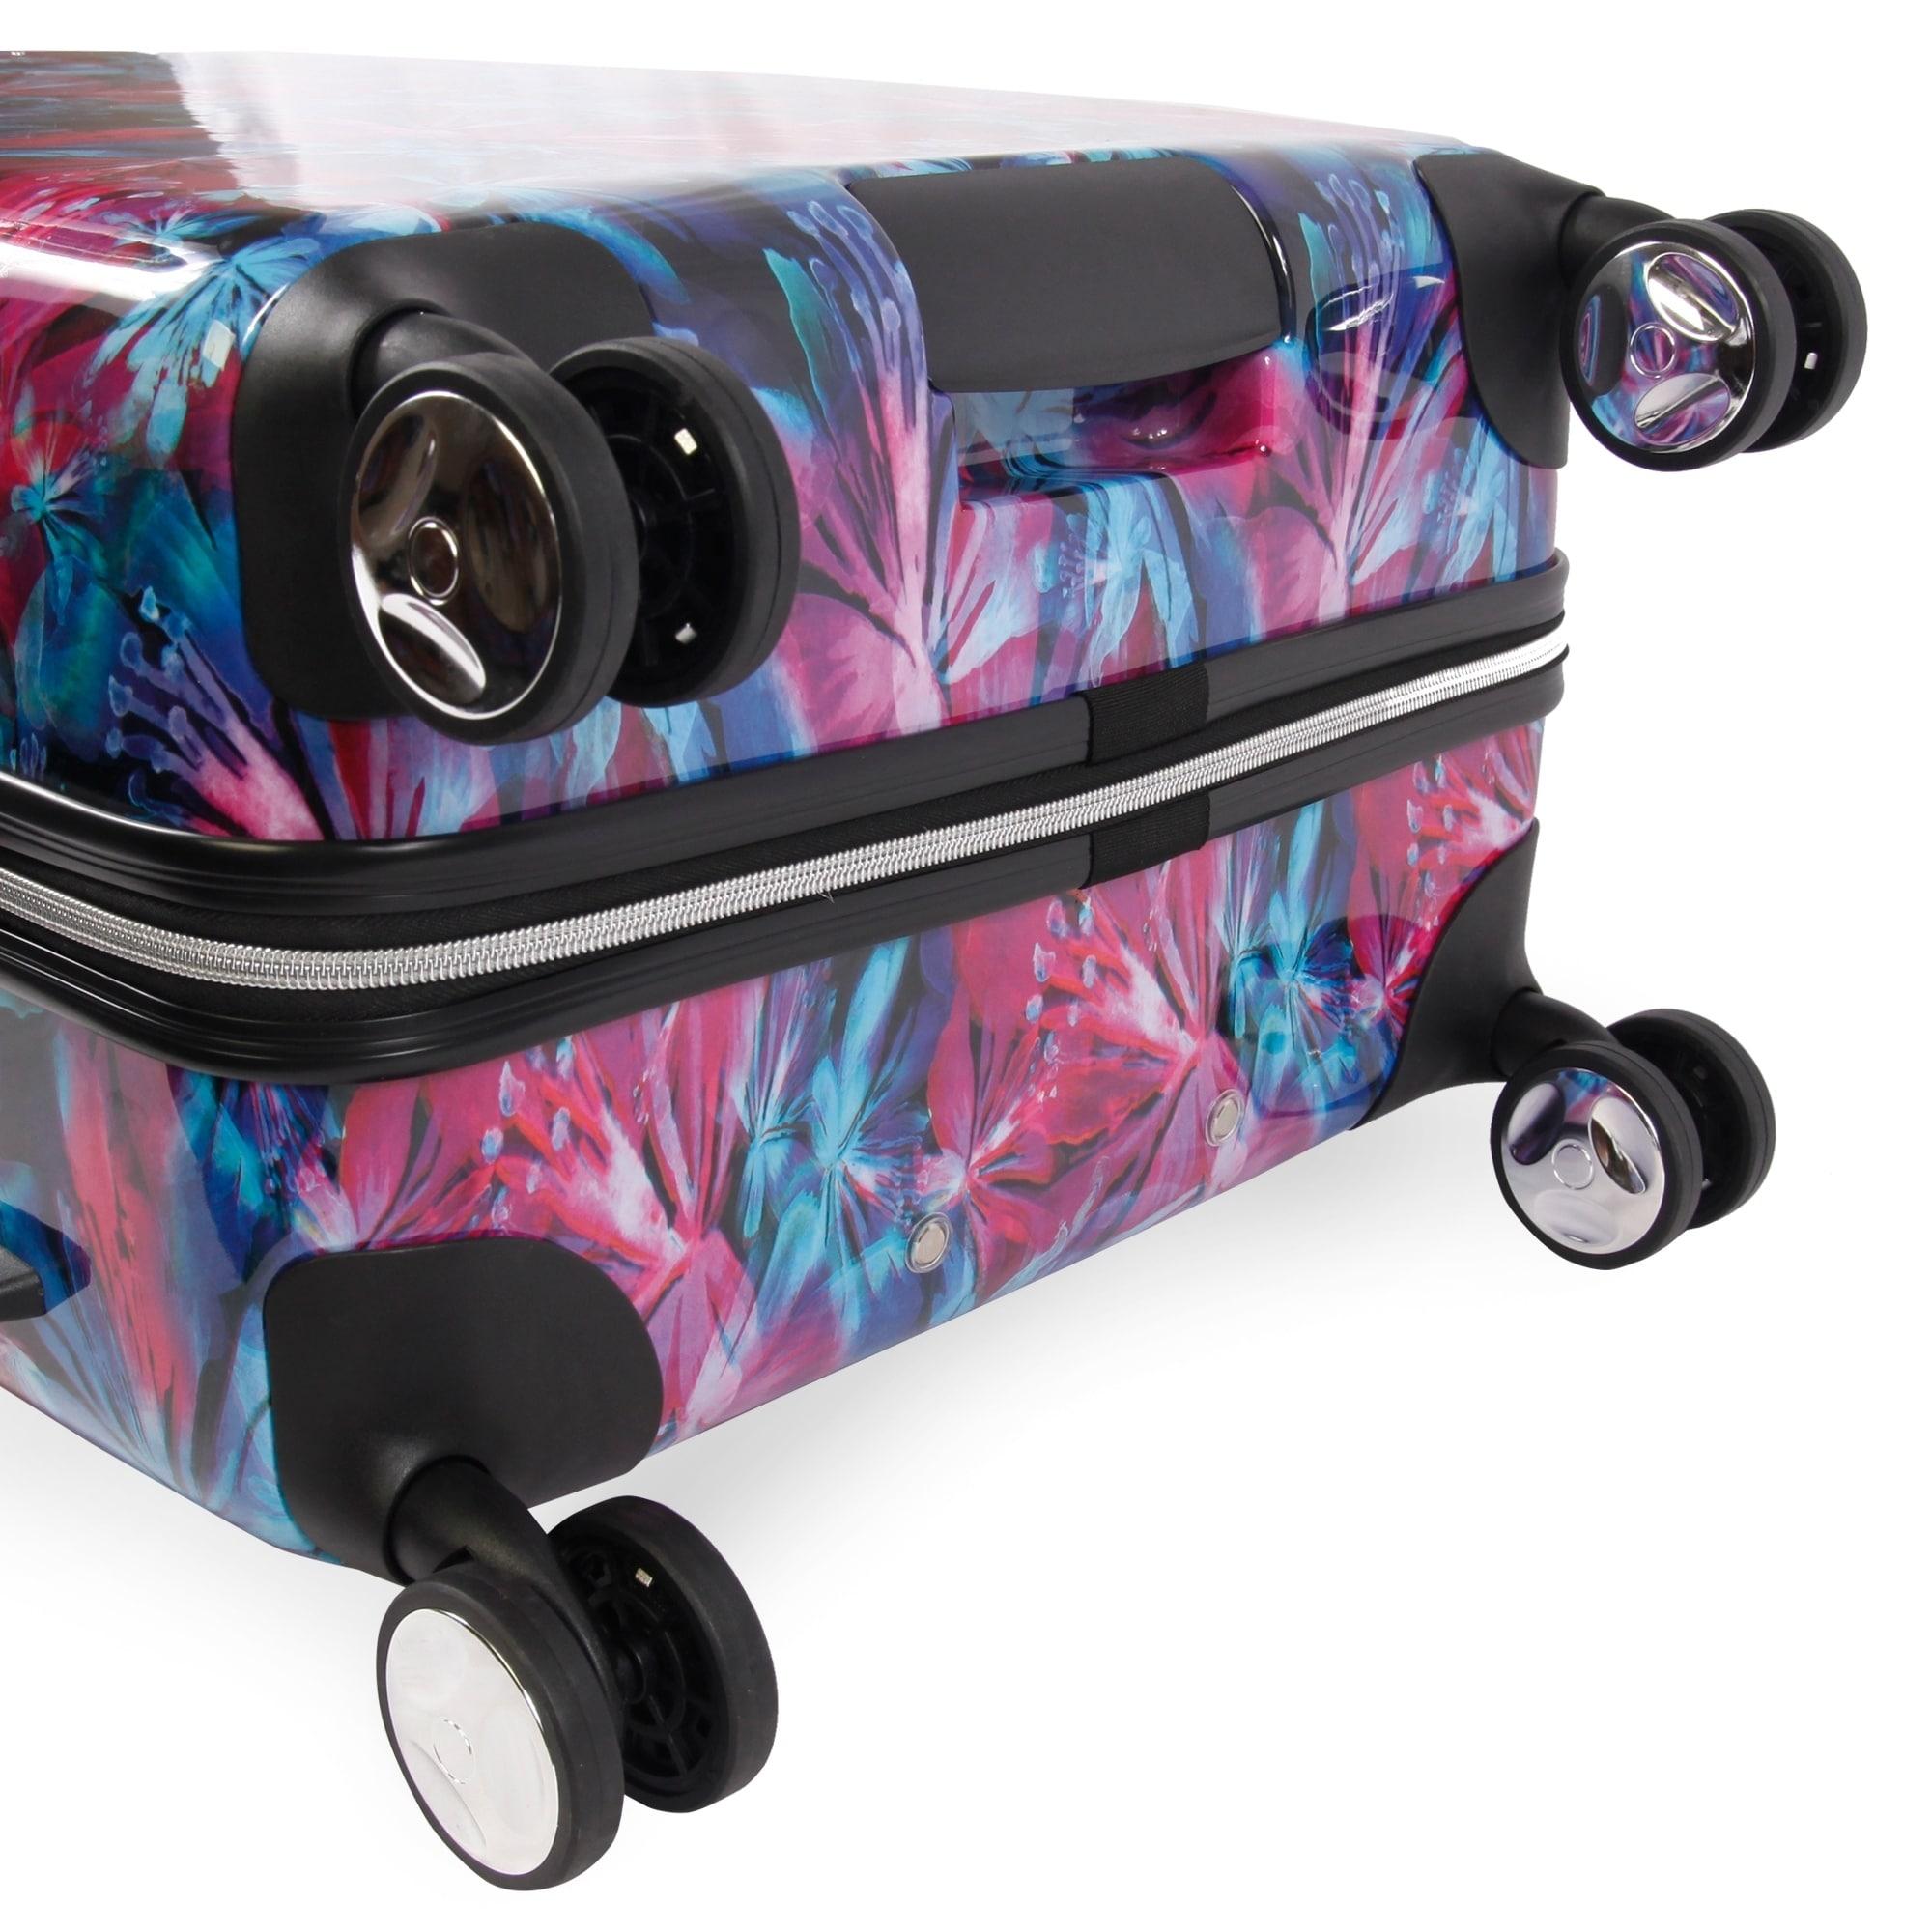 225c6c187 Shop Bebe Tina 3-pc Hardside Spinner Luggage Set - Free Shipping Today -  Overstock - 24266126